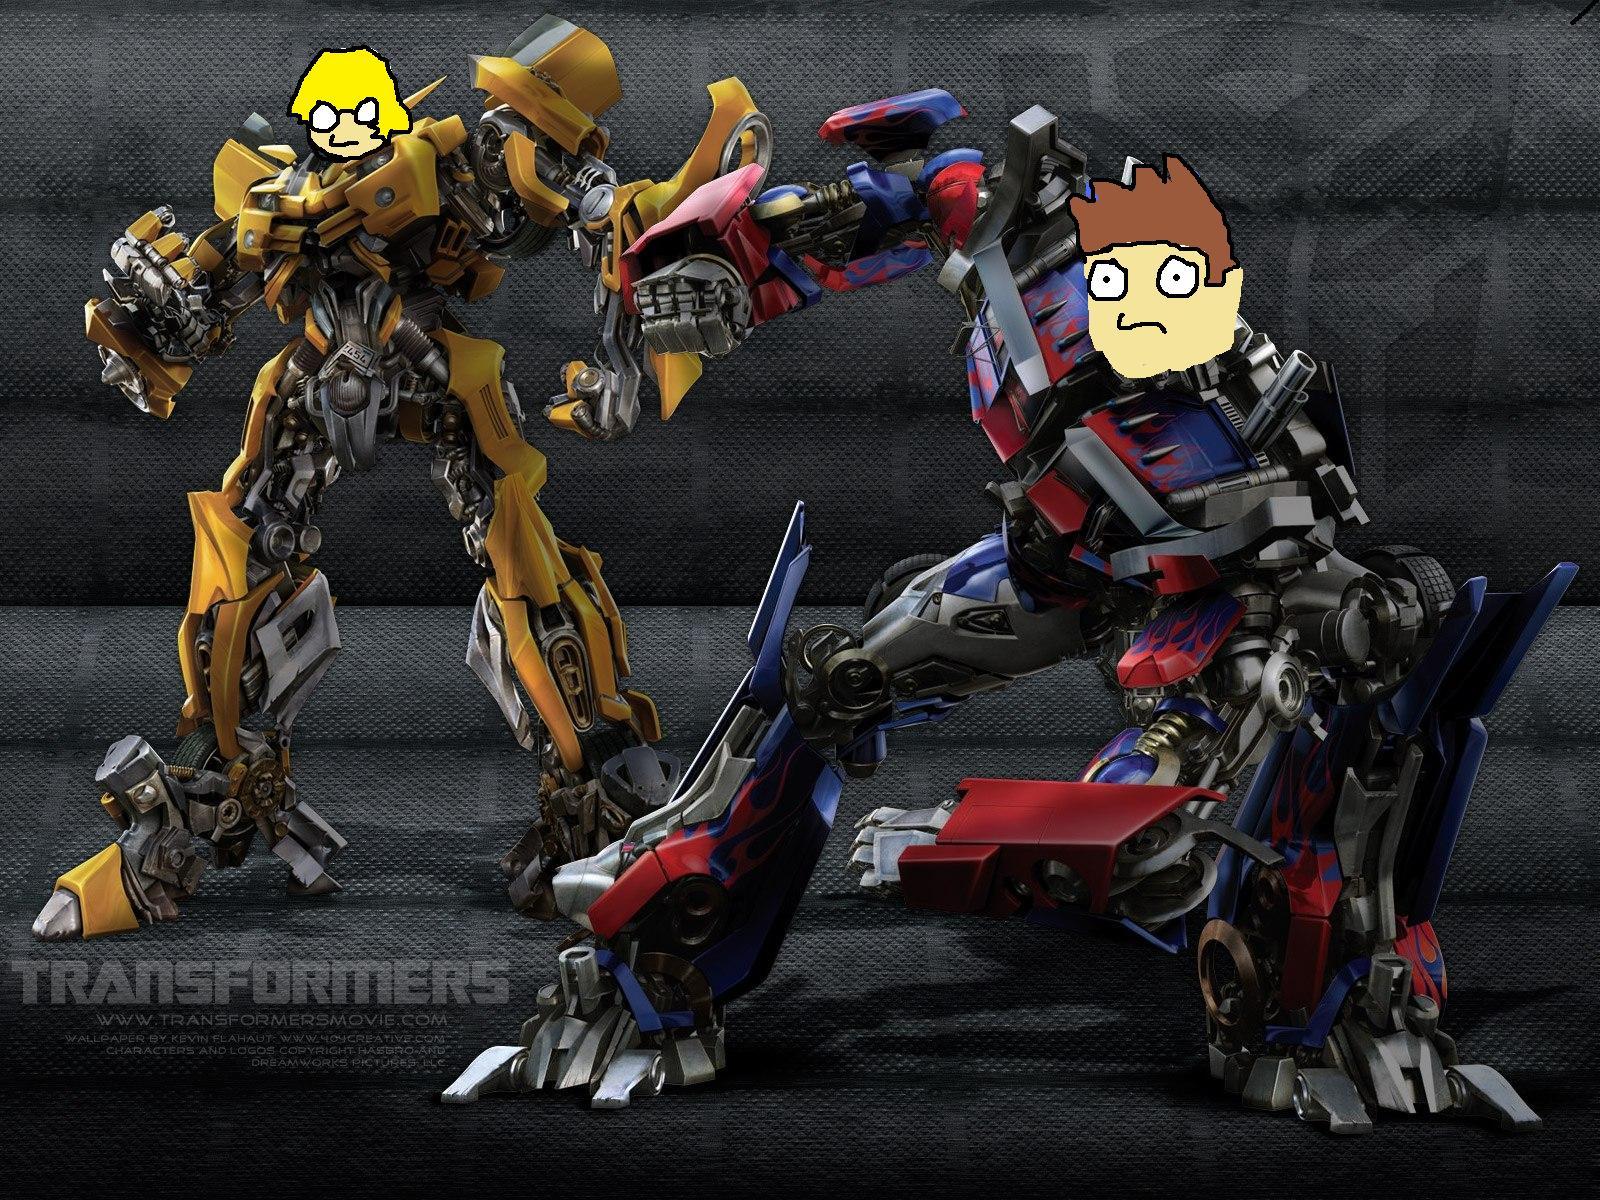 The dudes Transformers L&R